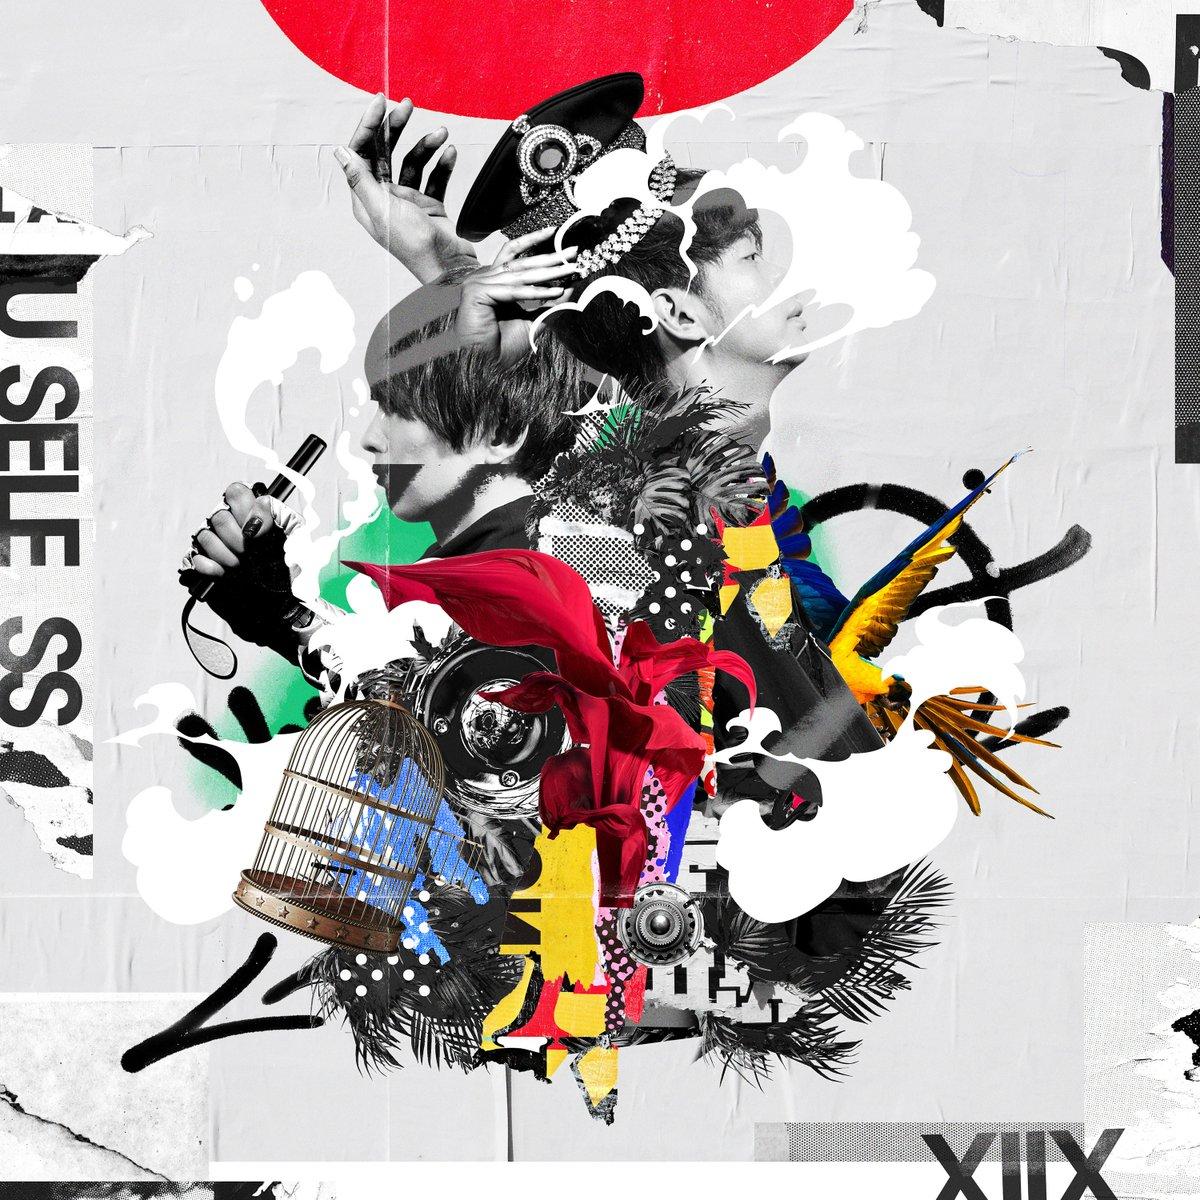 『XIIX - Endless Summer』収録の『USELESS』ジャケット